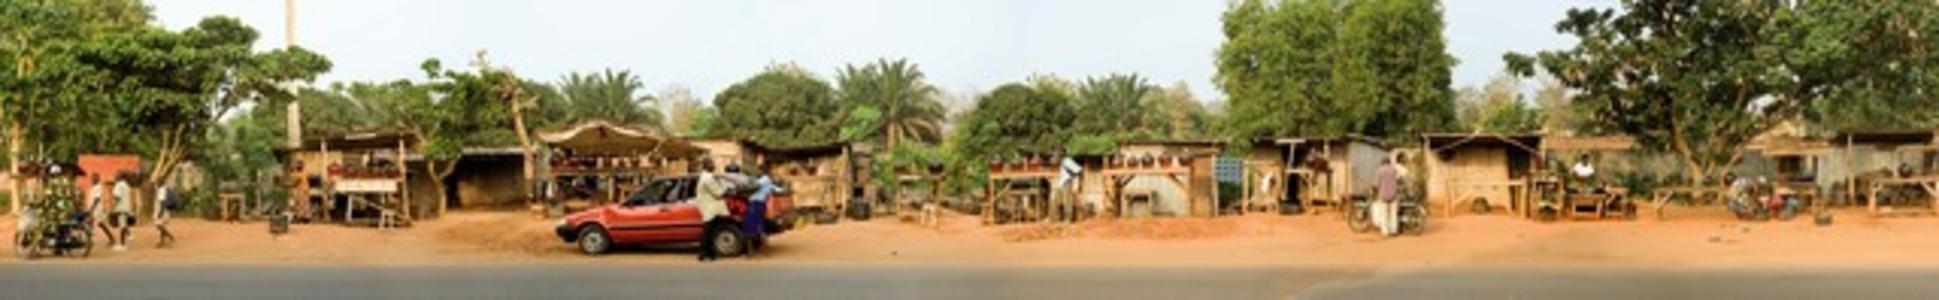 Station d'essence d'Abomey Calavi